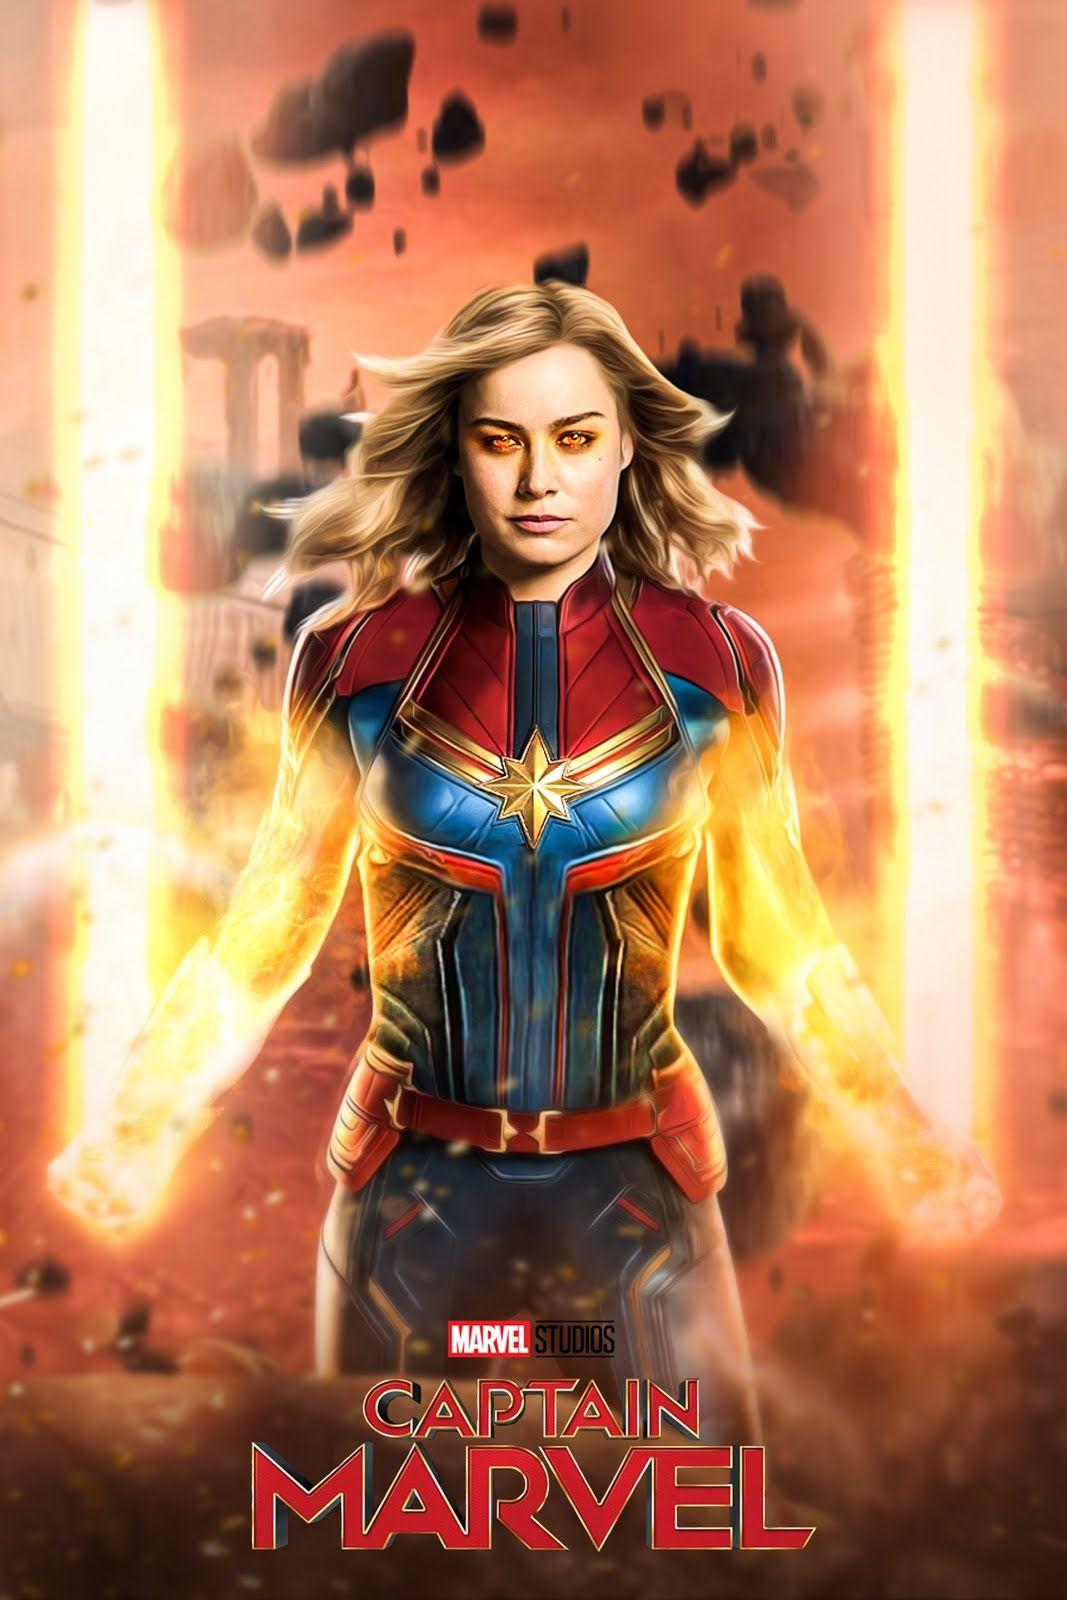 download film captain marvel (2019) kualitas hdts subtitle indonesia